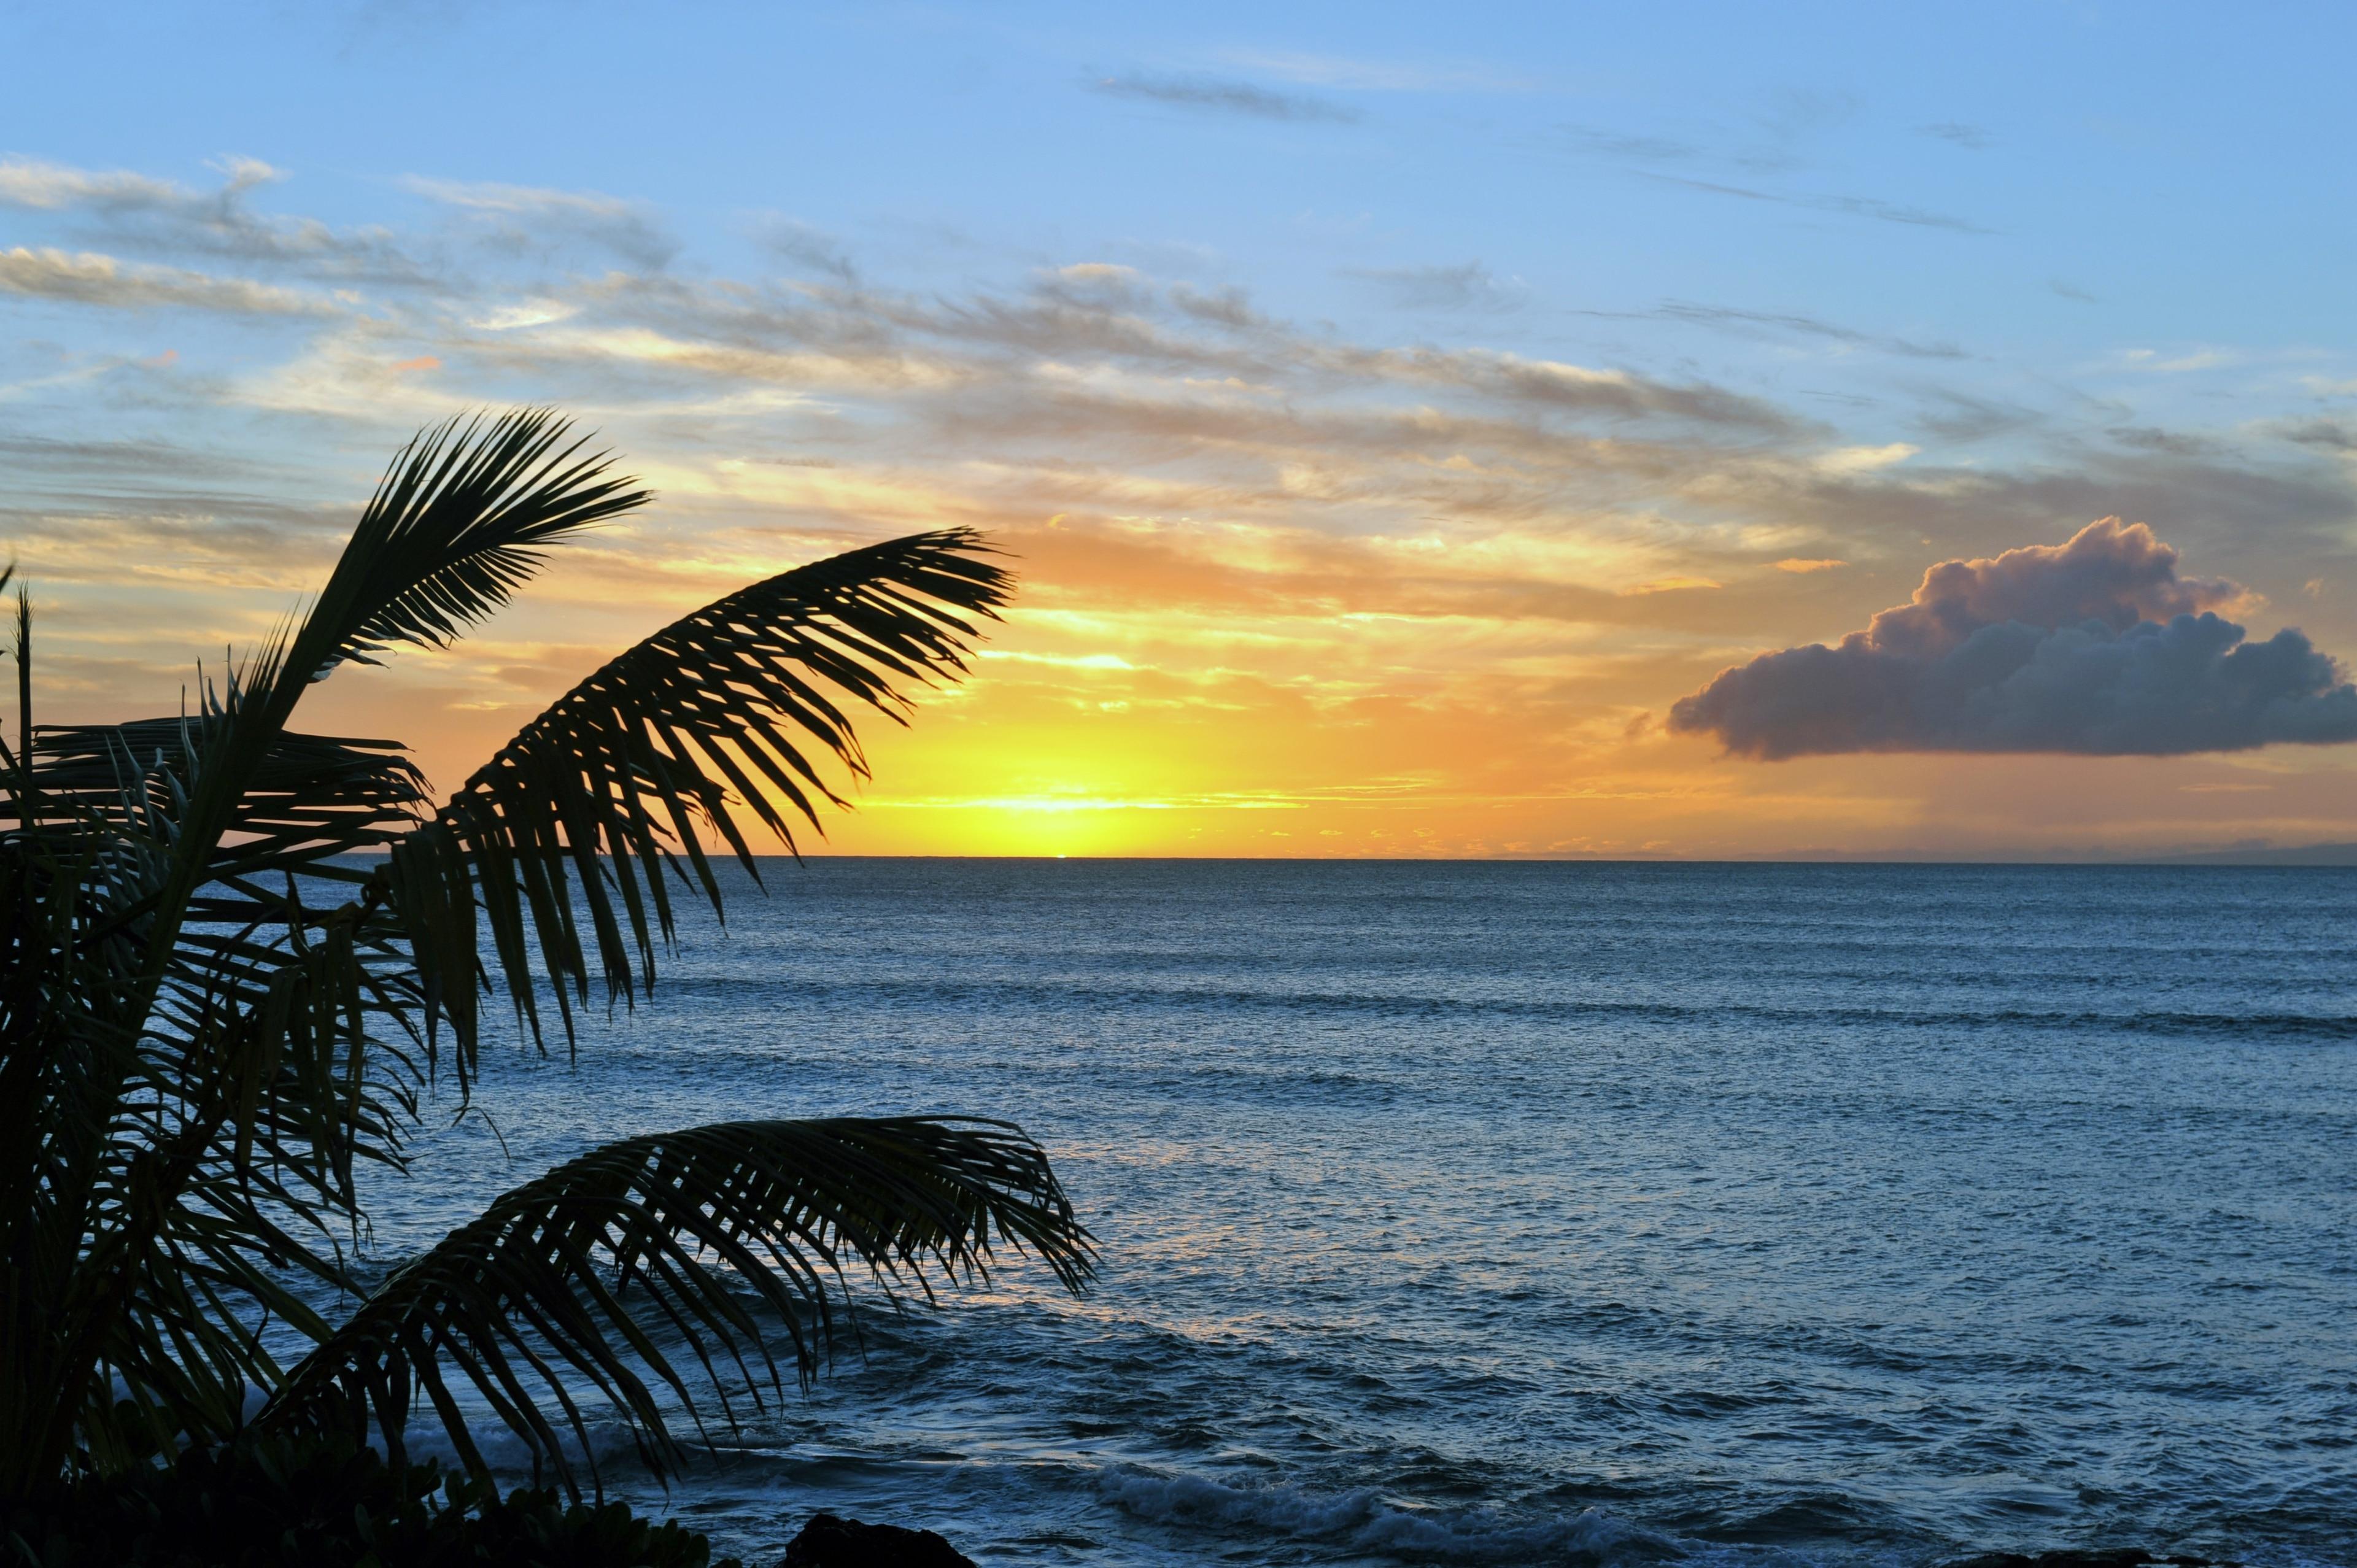 Napili-Honokowai, Hawaii, USA